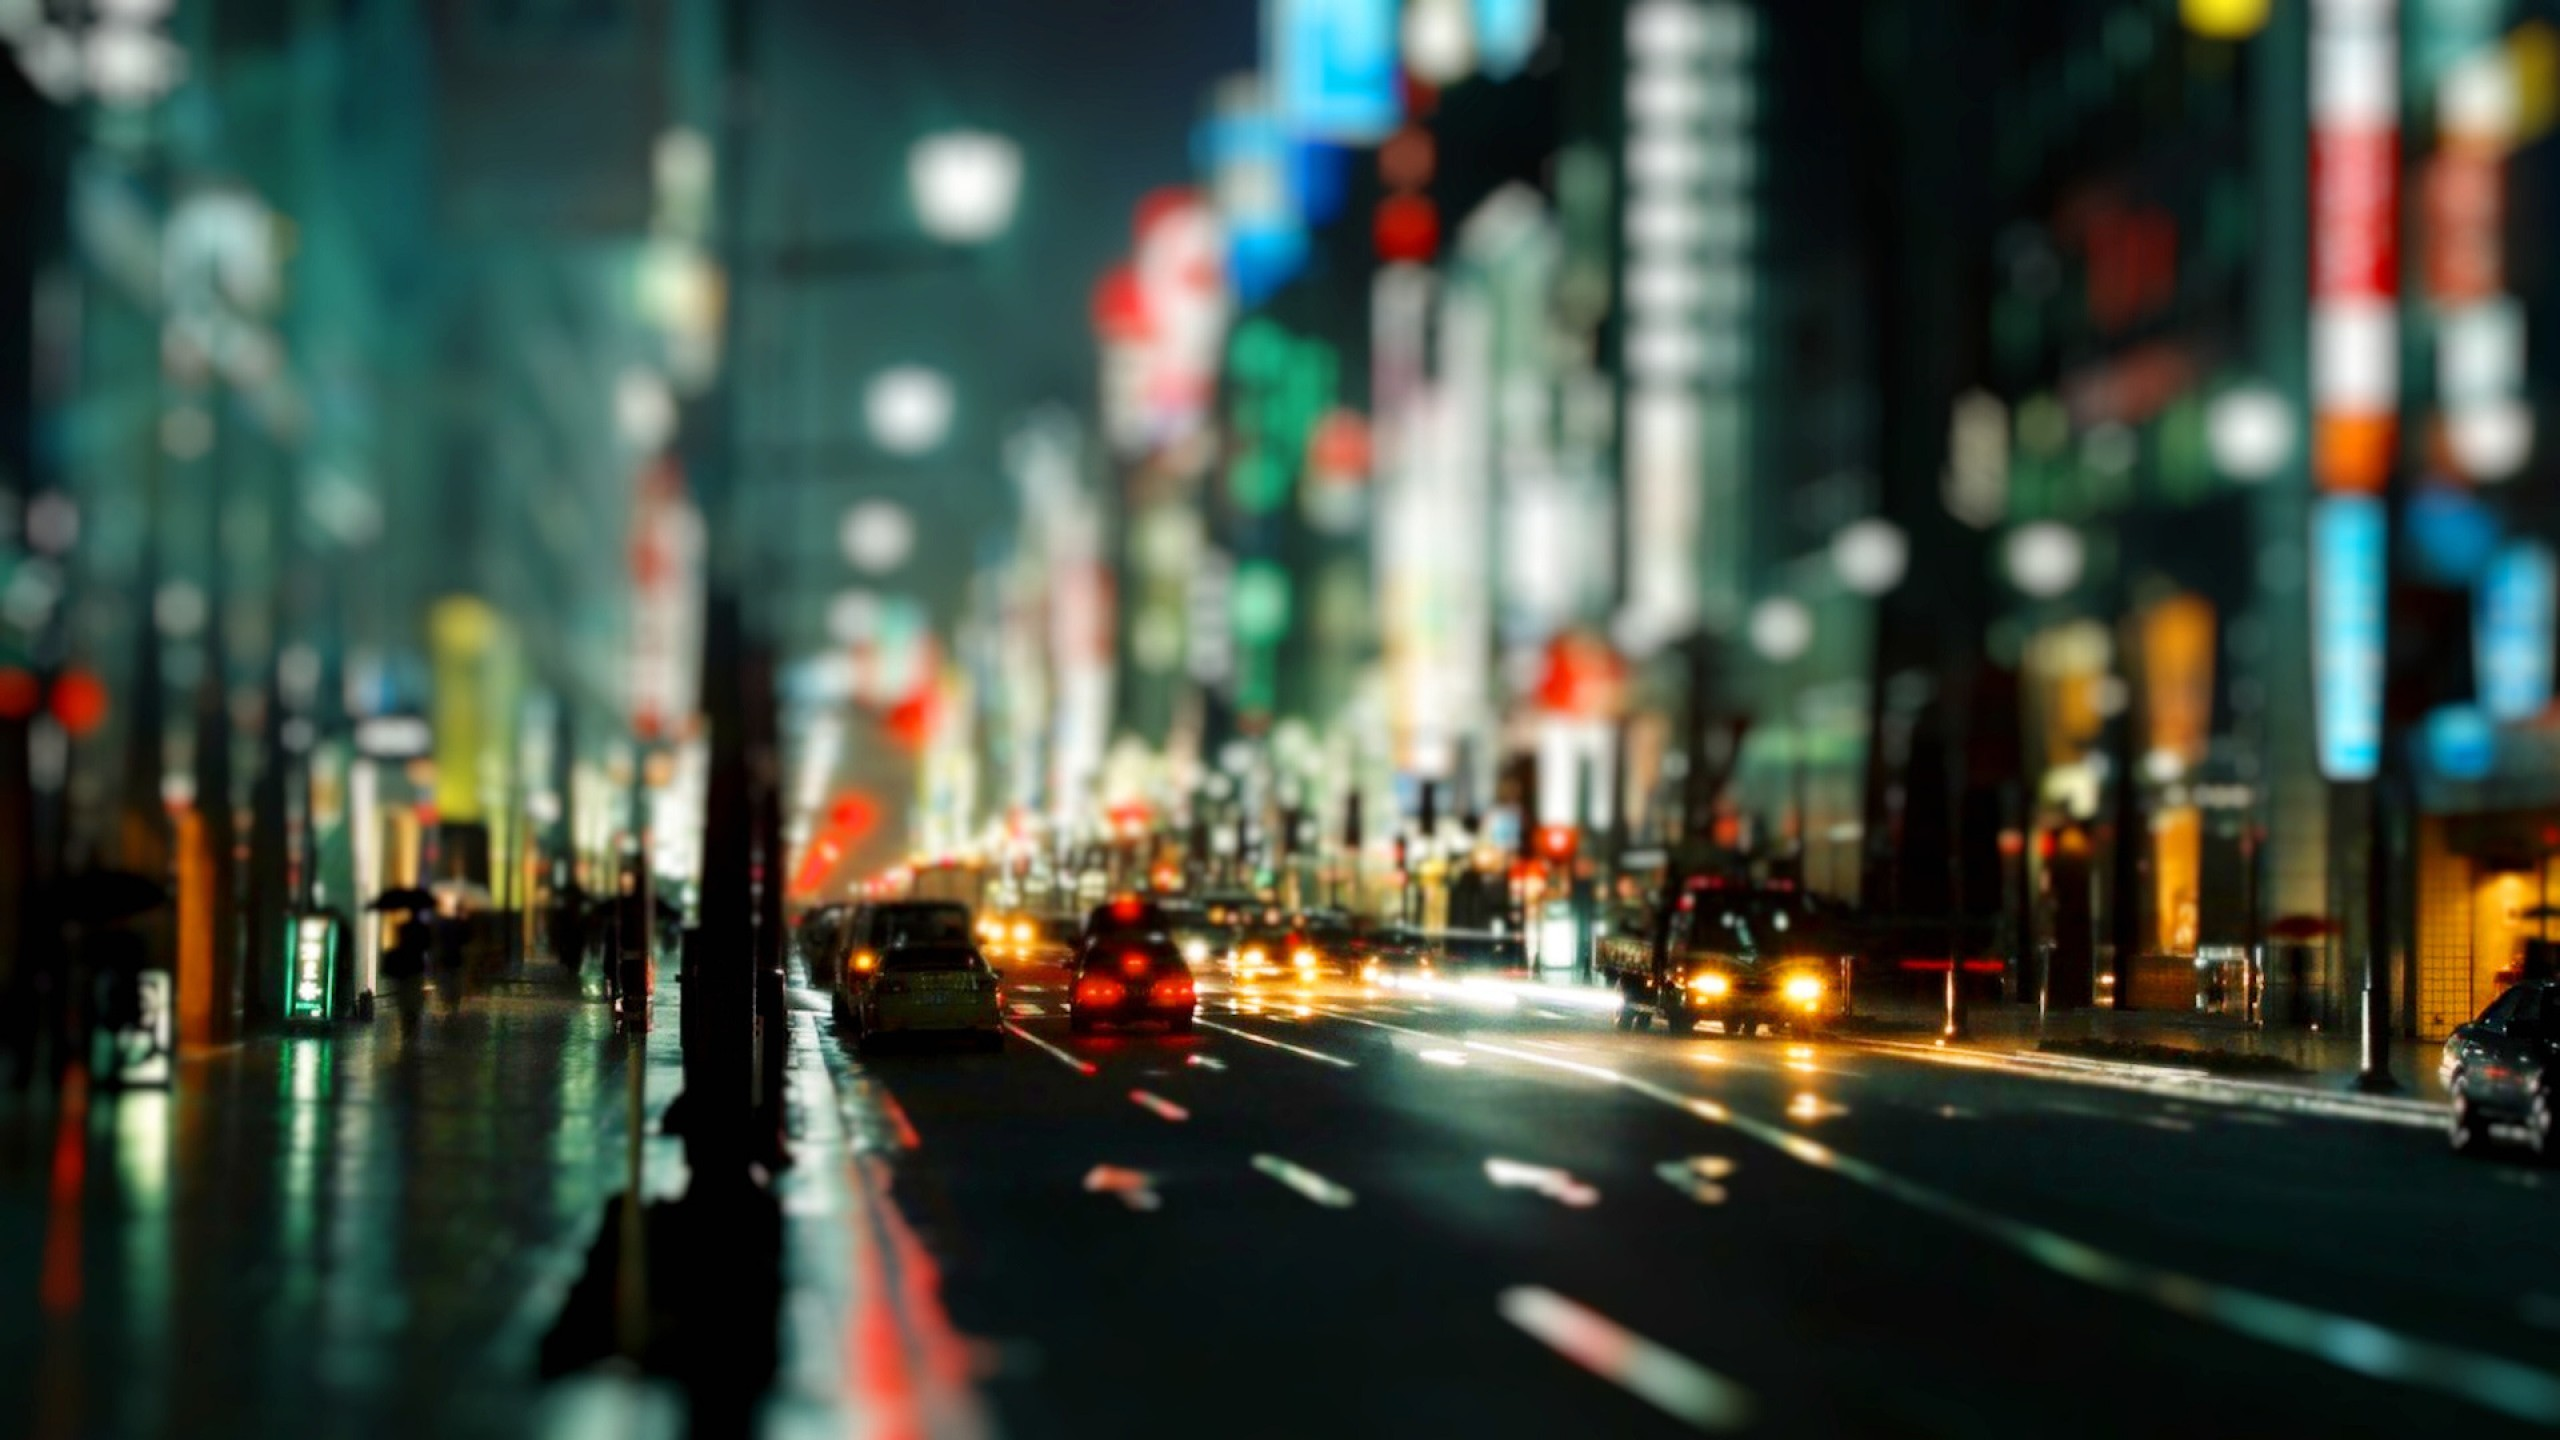 City Street Night Background Wallpaper